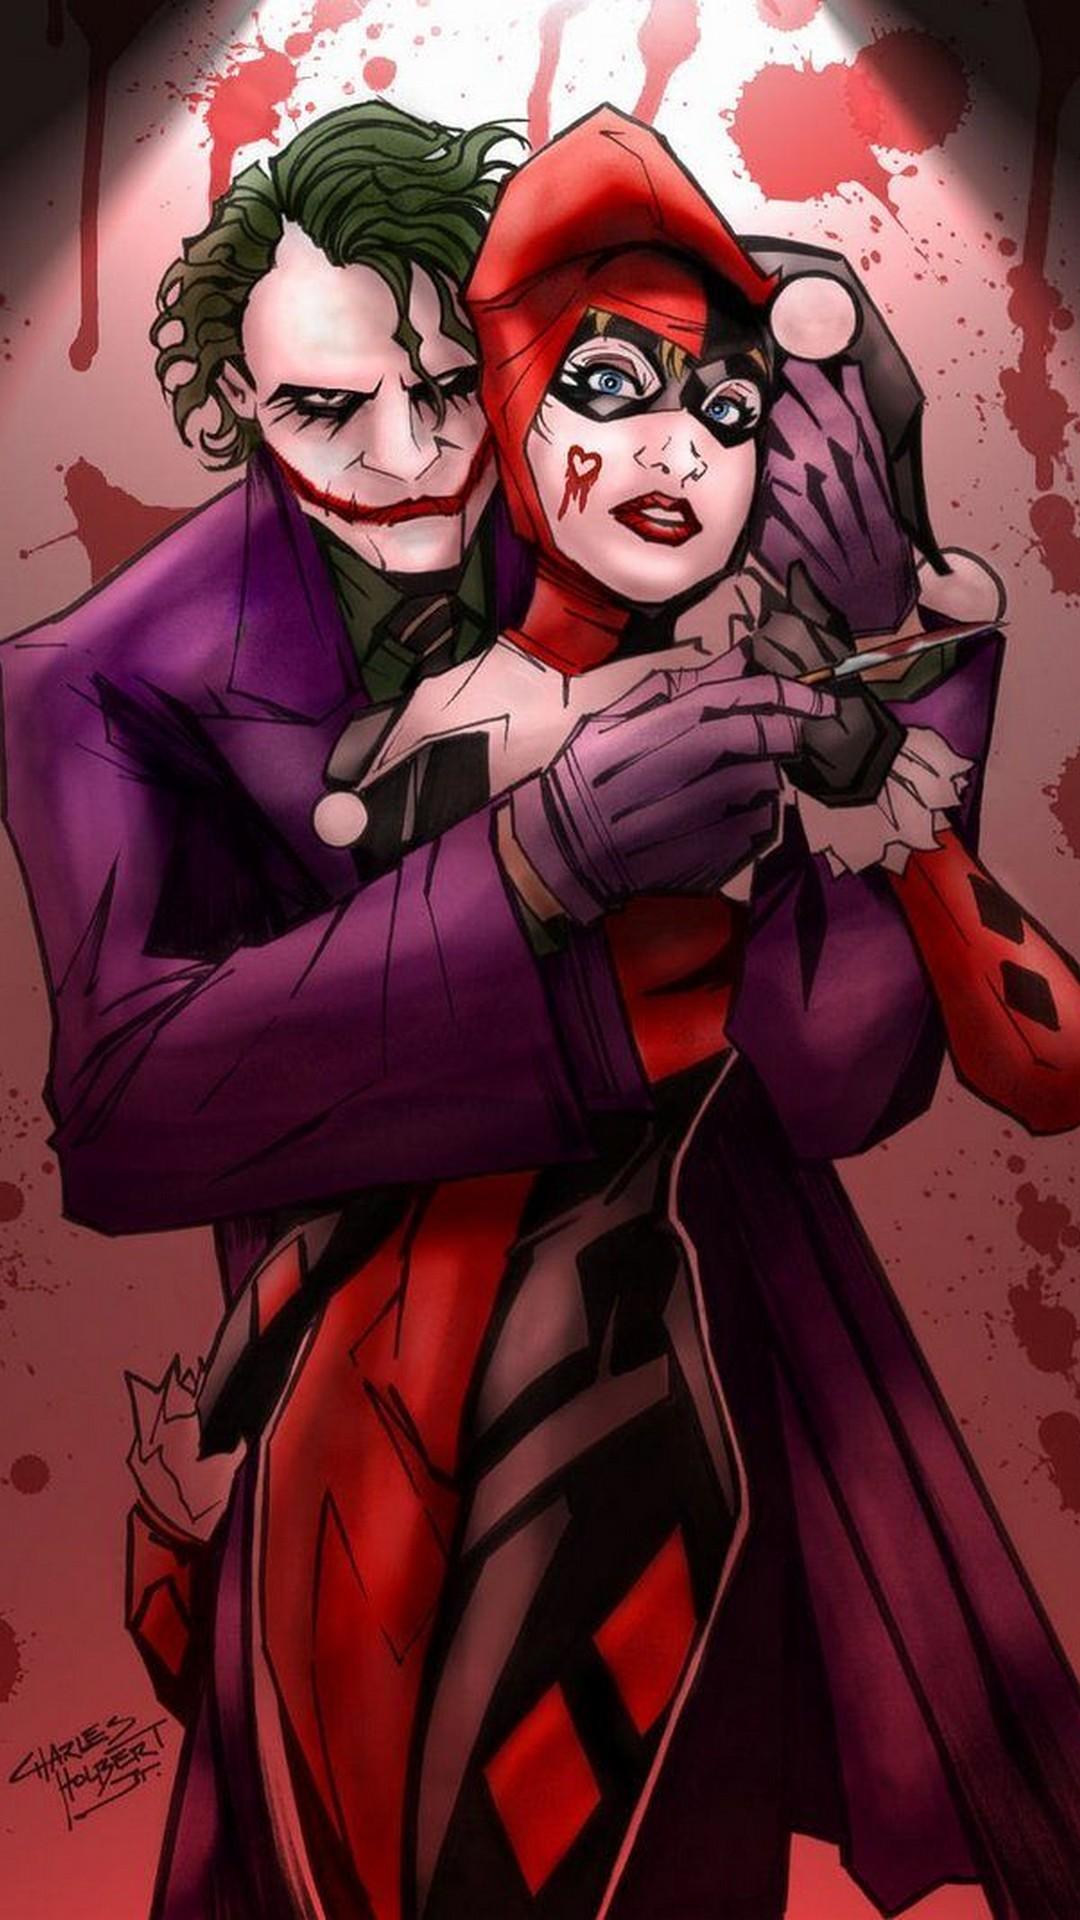 Free Joker And Harley IPhone Wallpaper 2019 3D